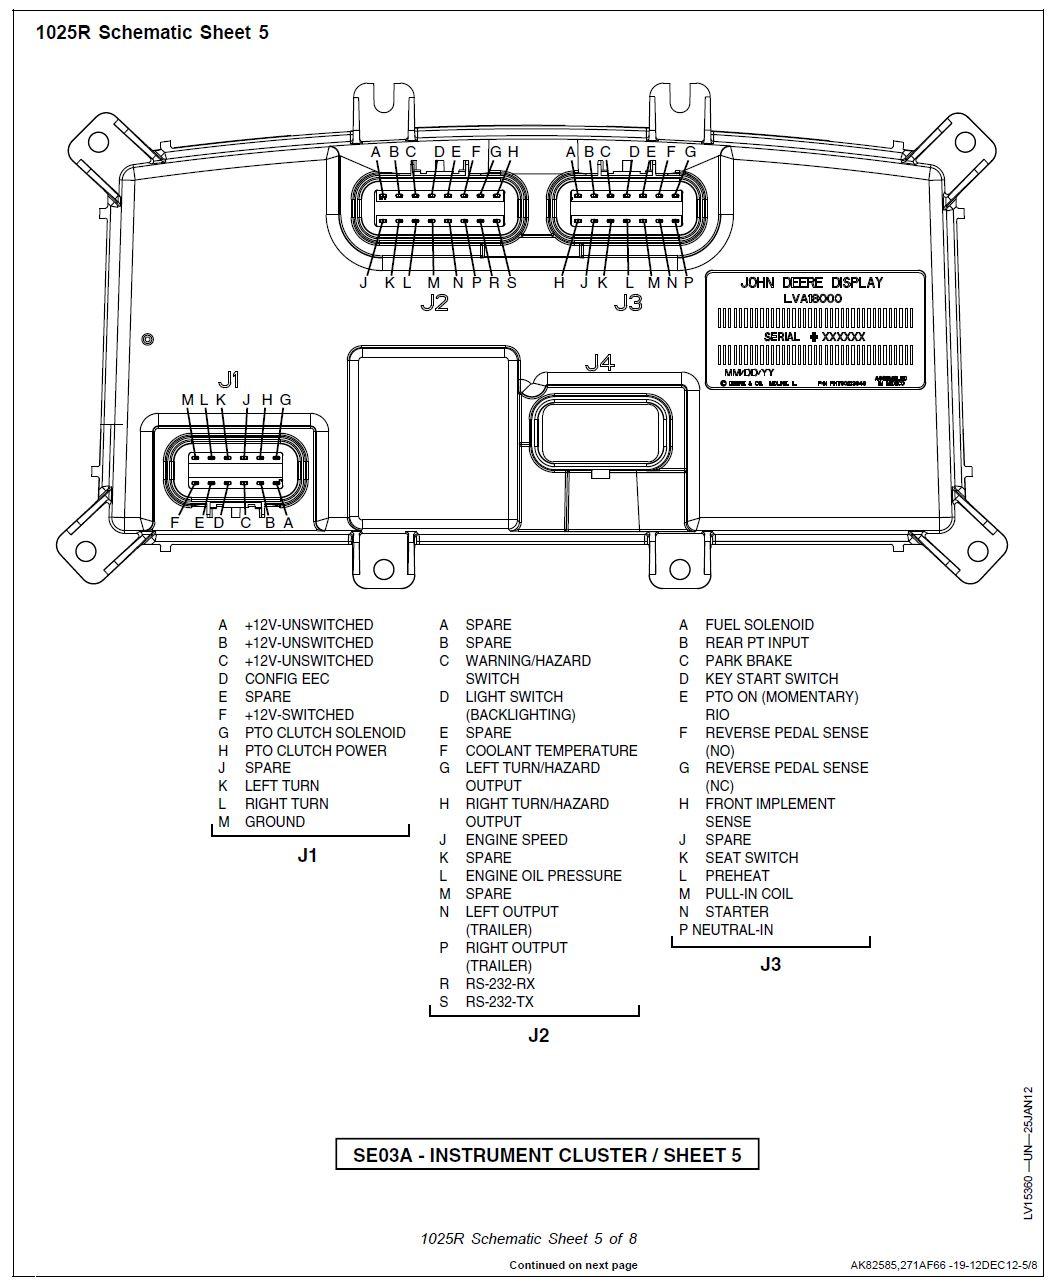 1025R ICC back wiring diagram.JPG